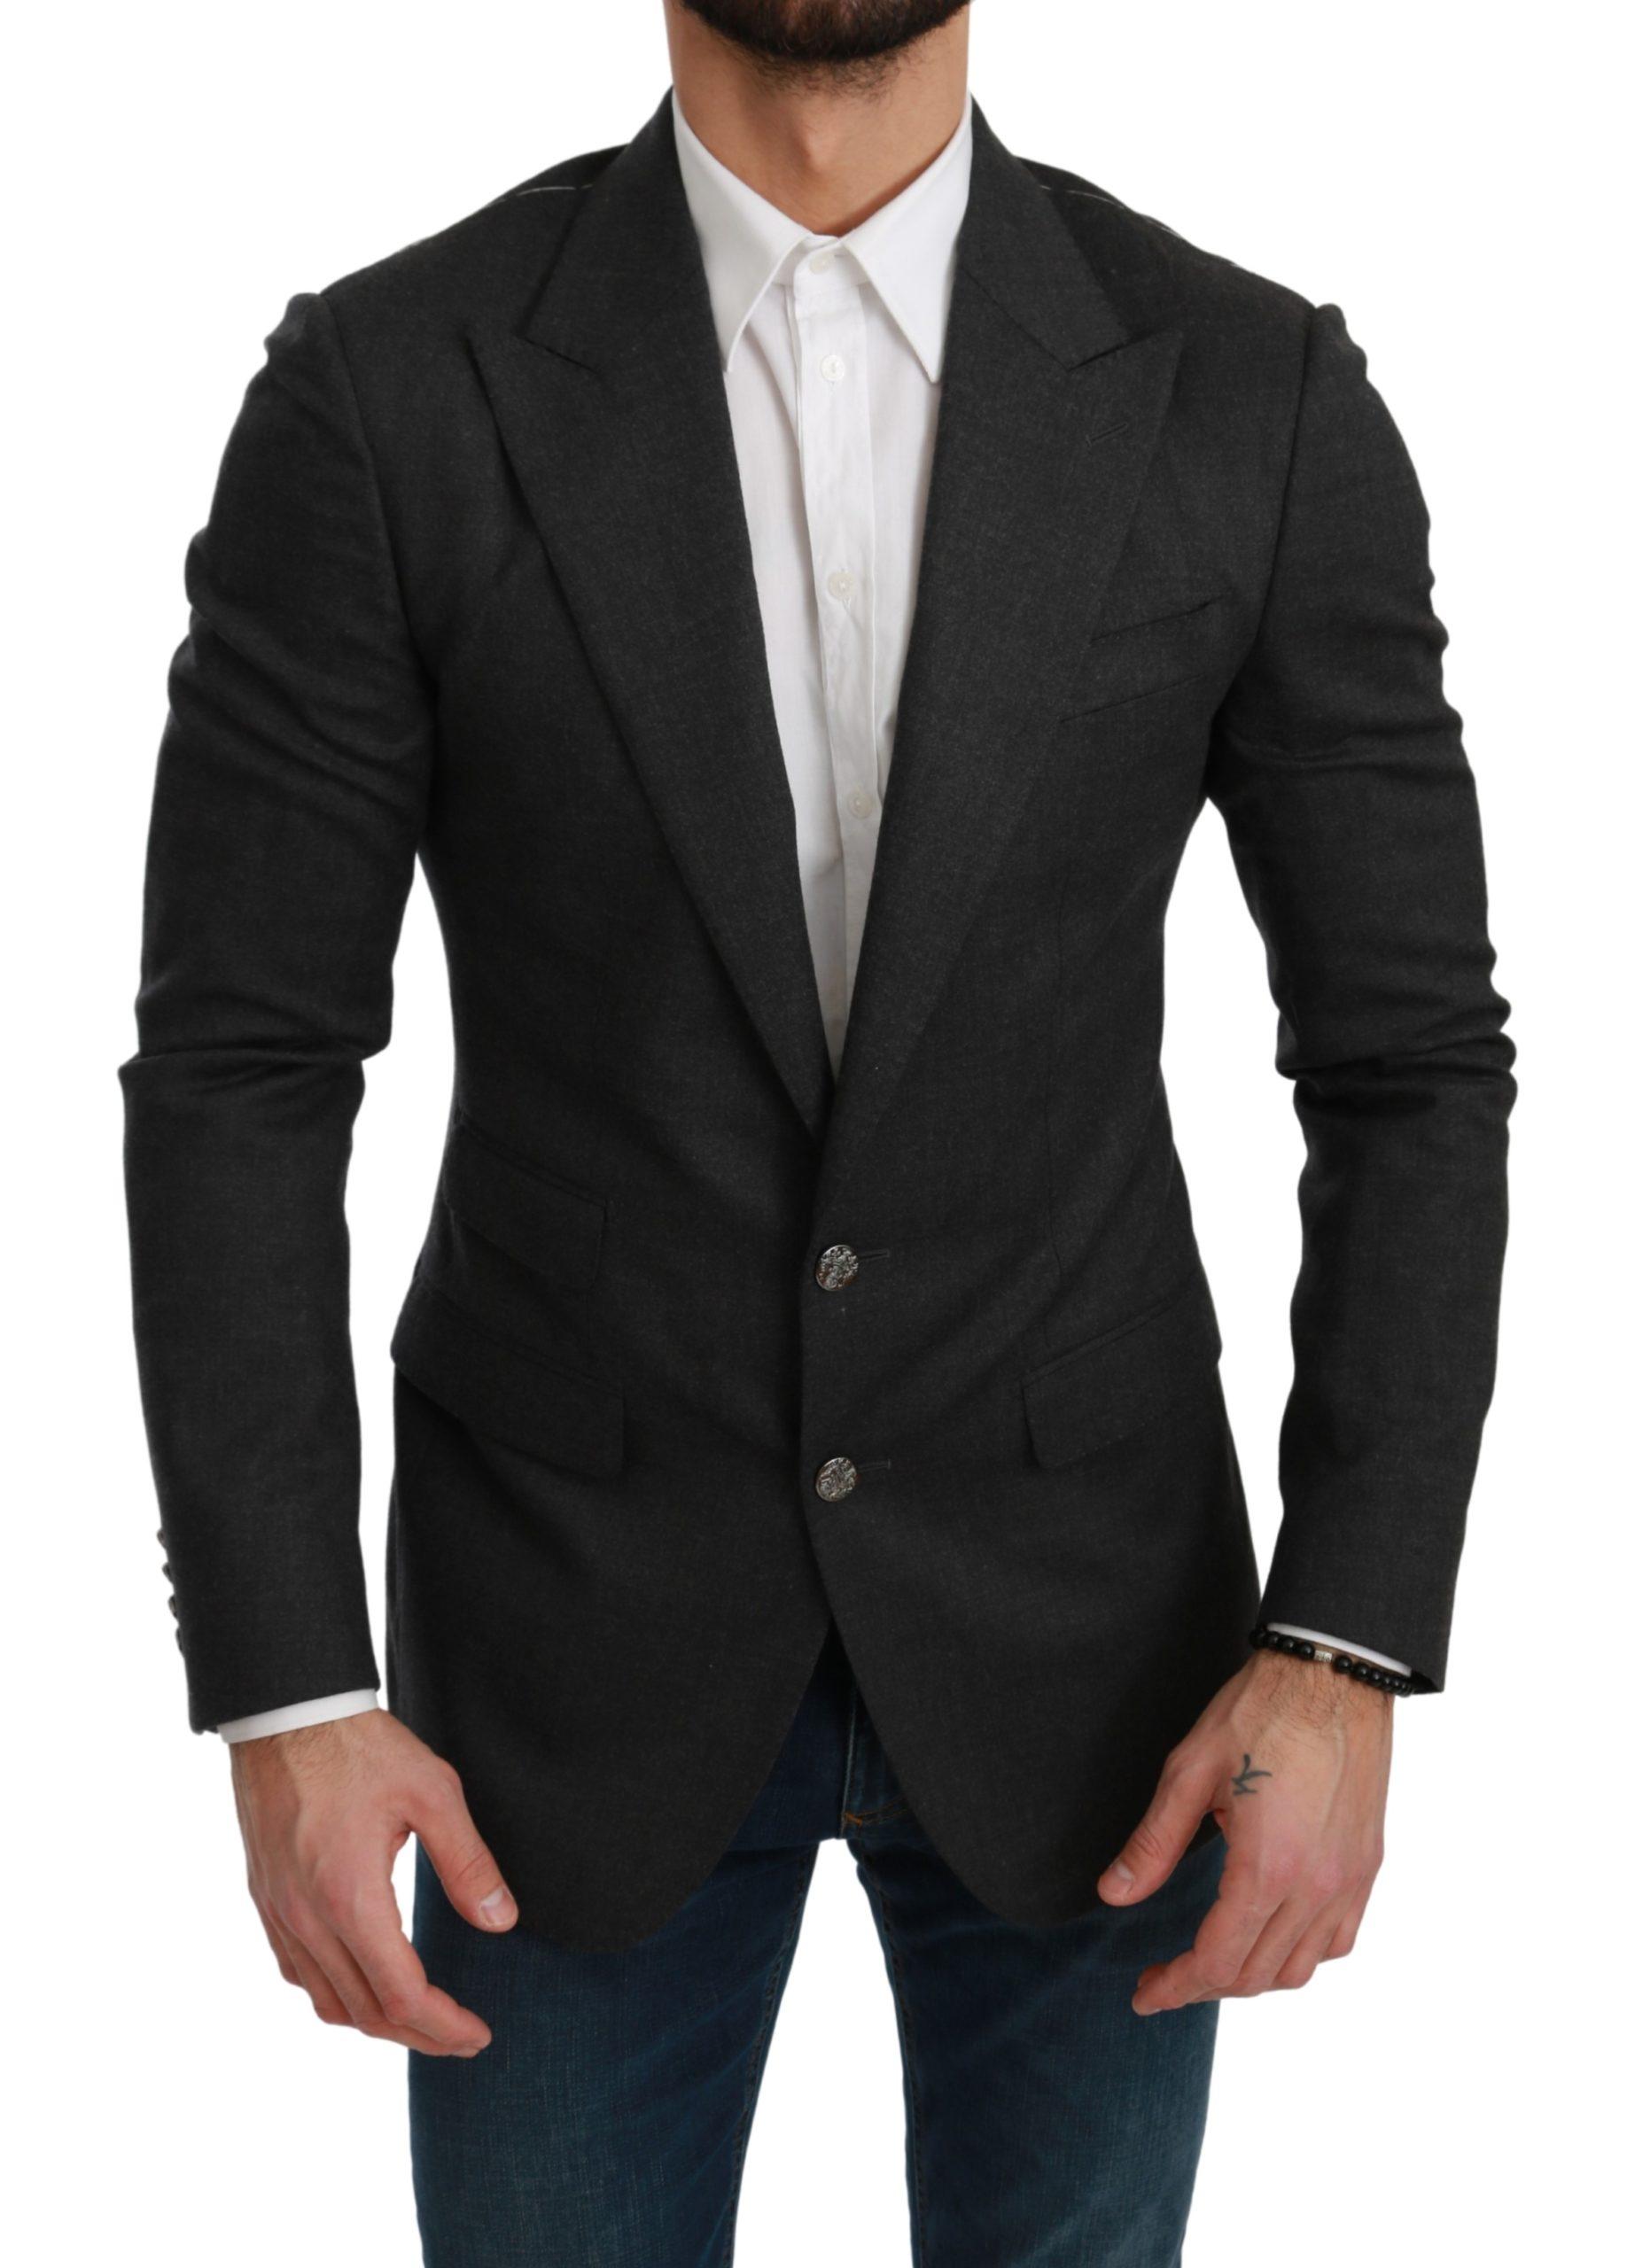 Dolce & Gabbana Men's NAPOLI Slim Fit Wool Blazer Gray KOS1772 - IT46 | S